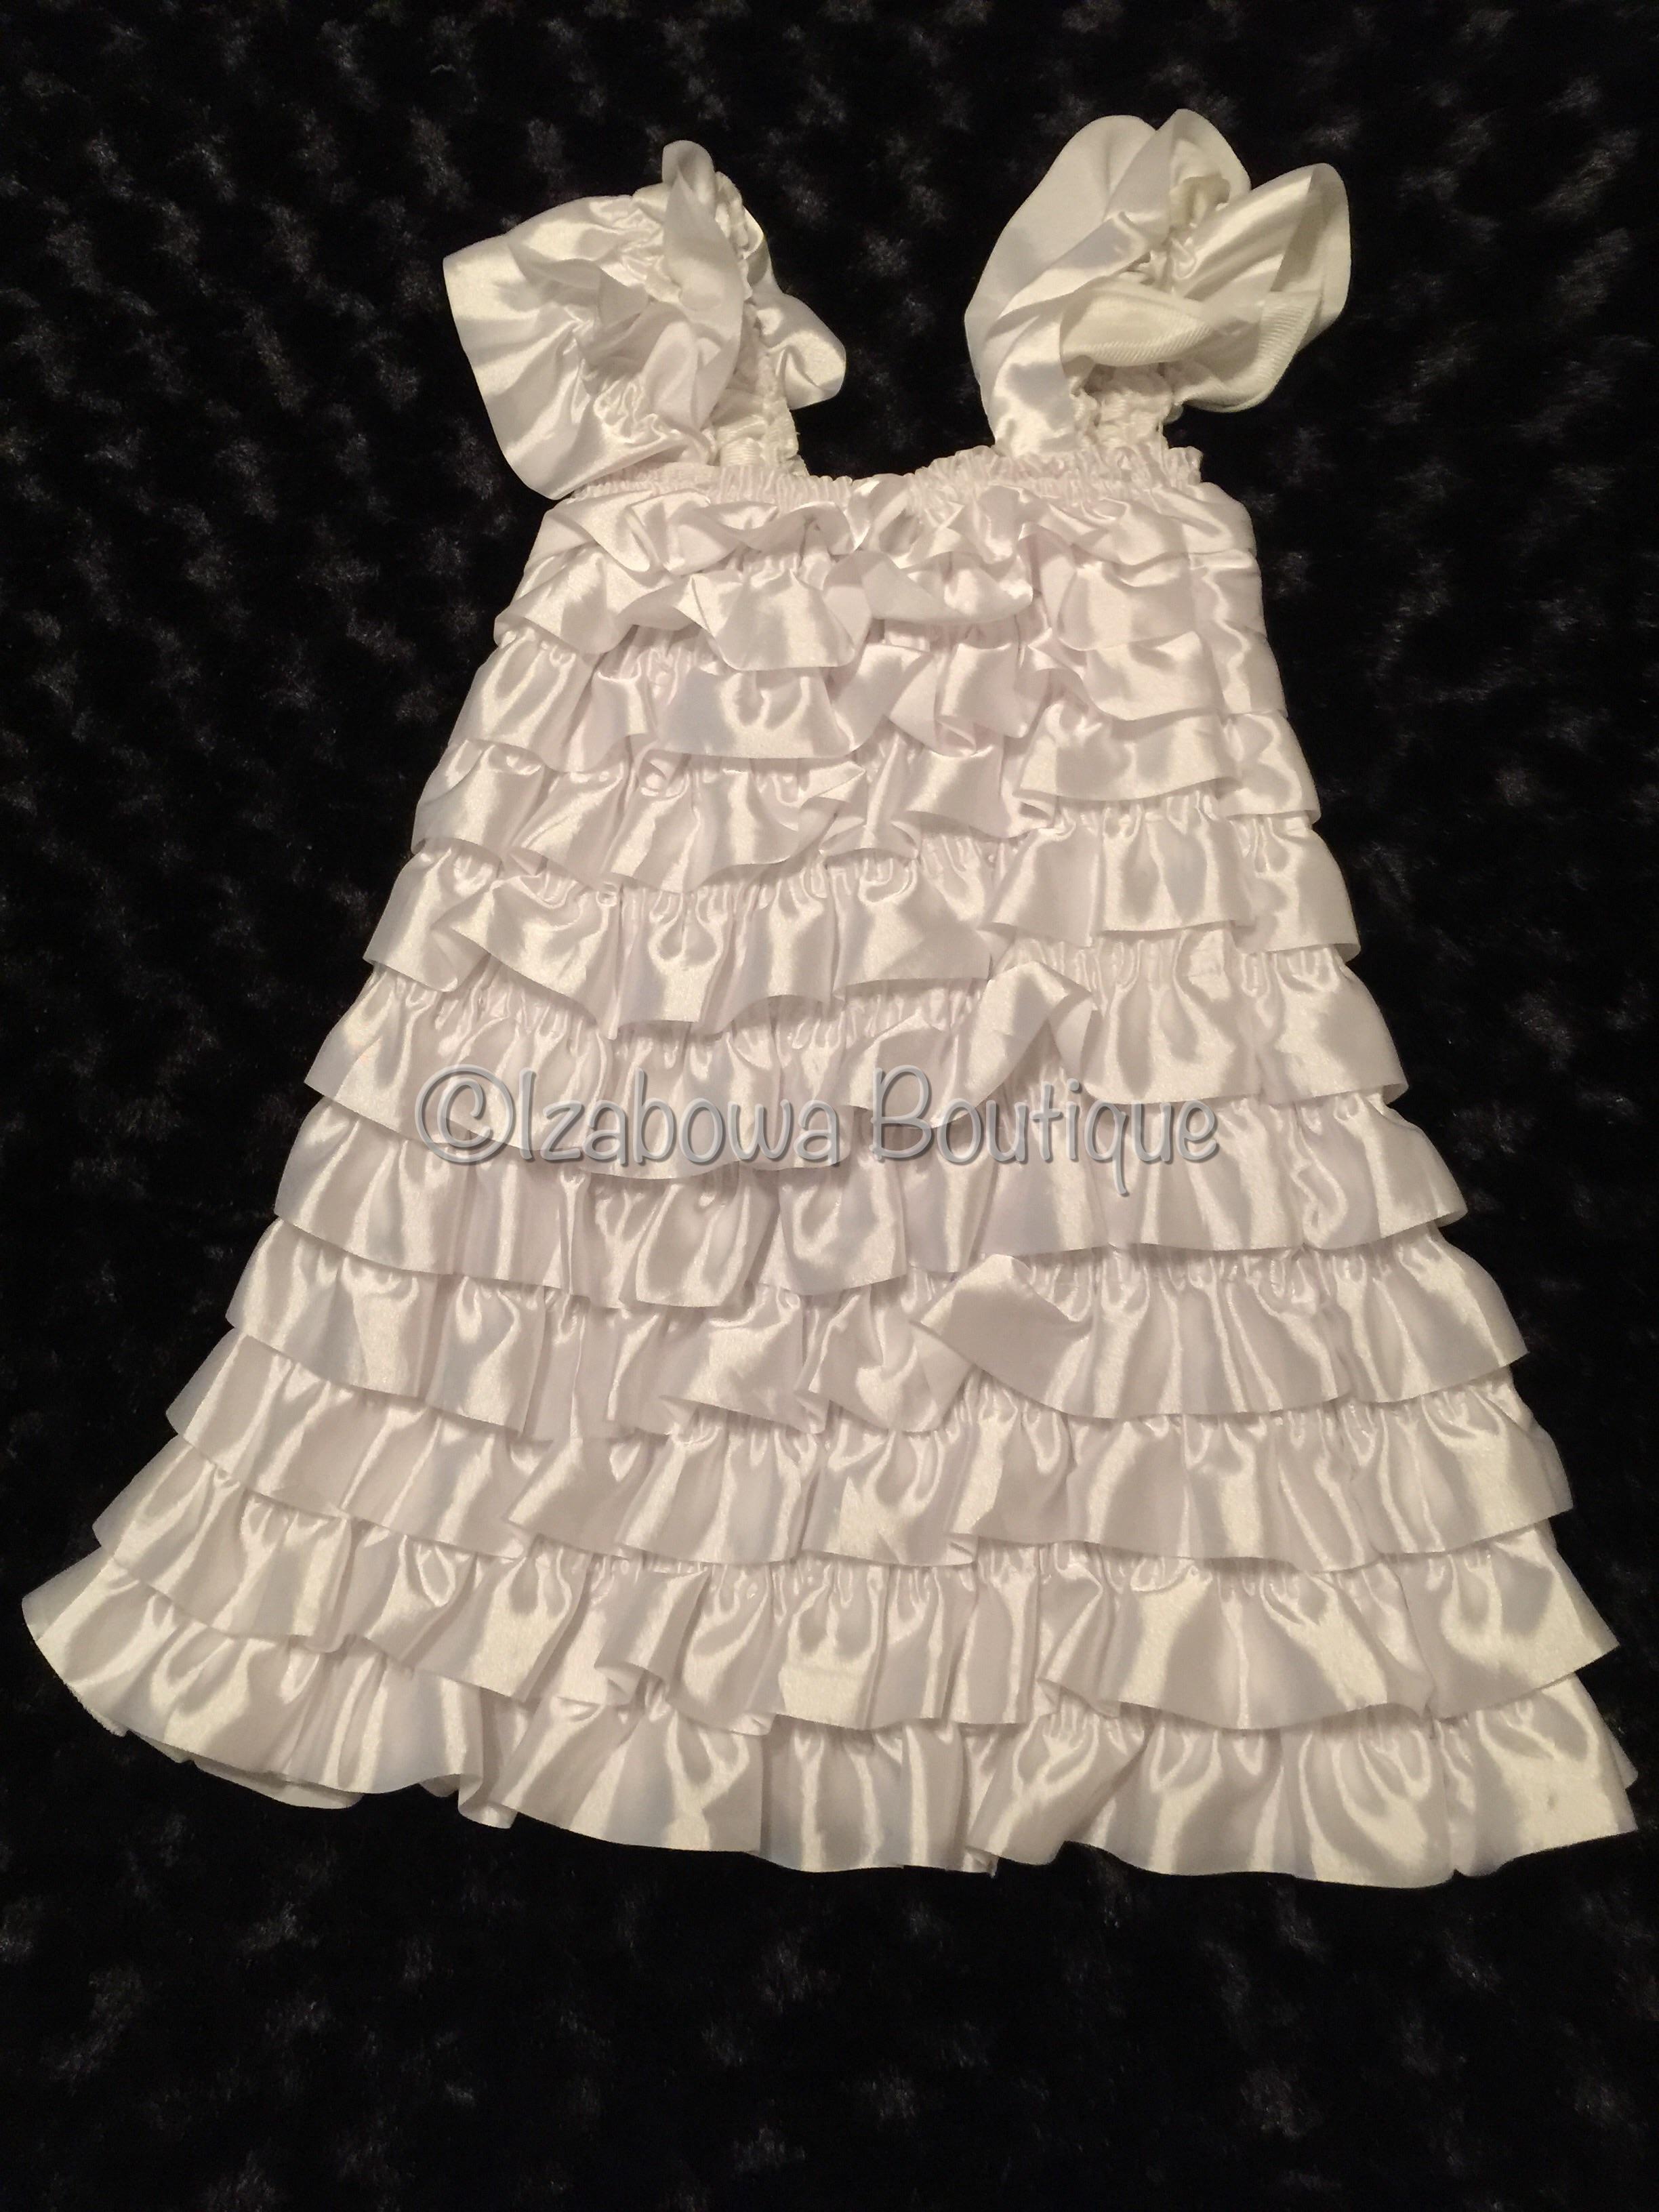 White Satin Romper Dress u00b7 izaBowa Boutique u00b7 Online Store Powered by Storenvy